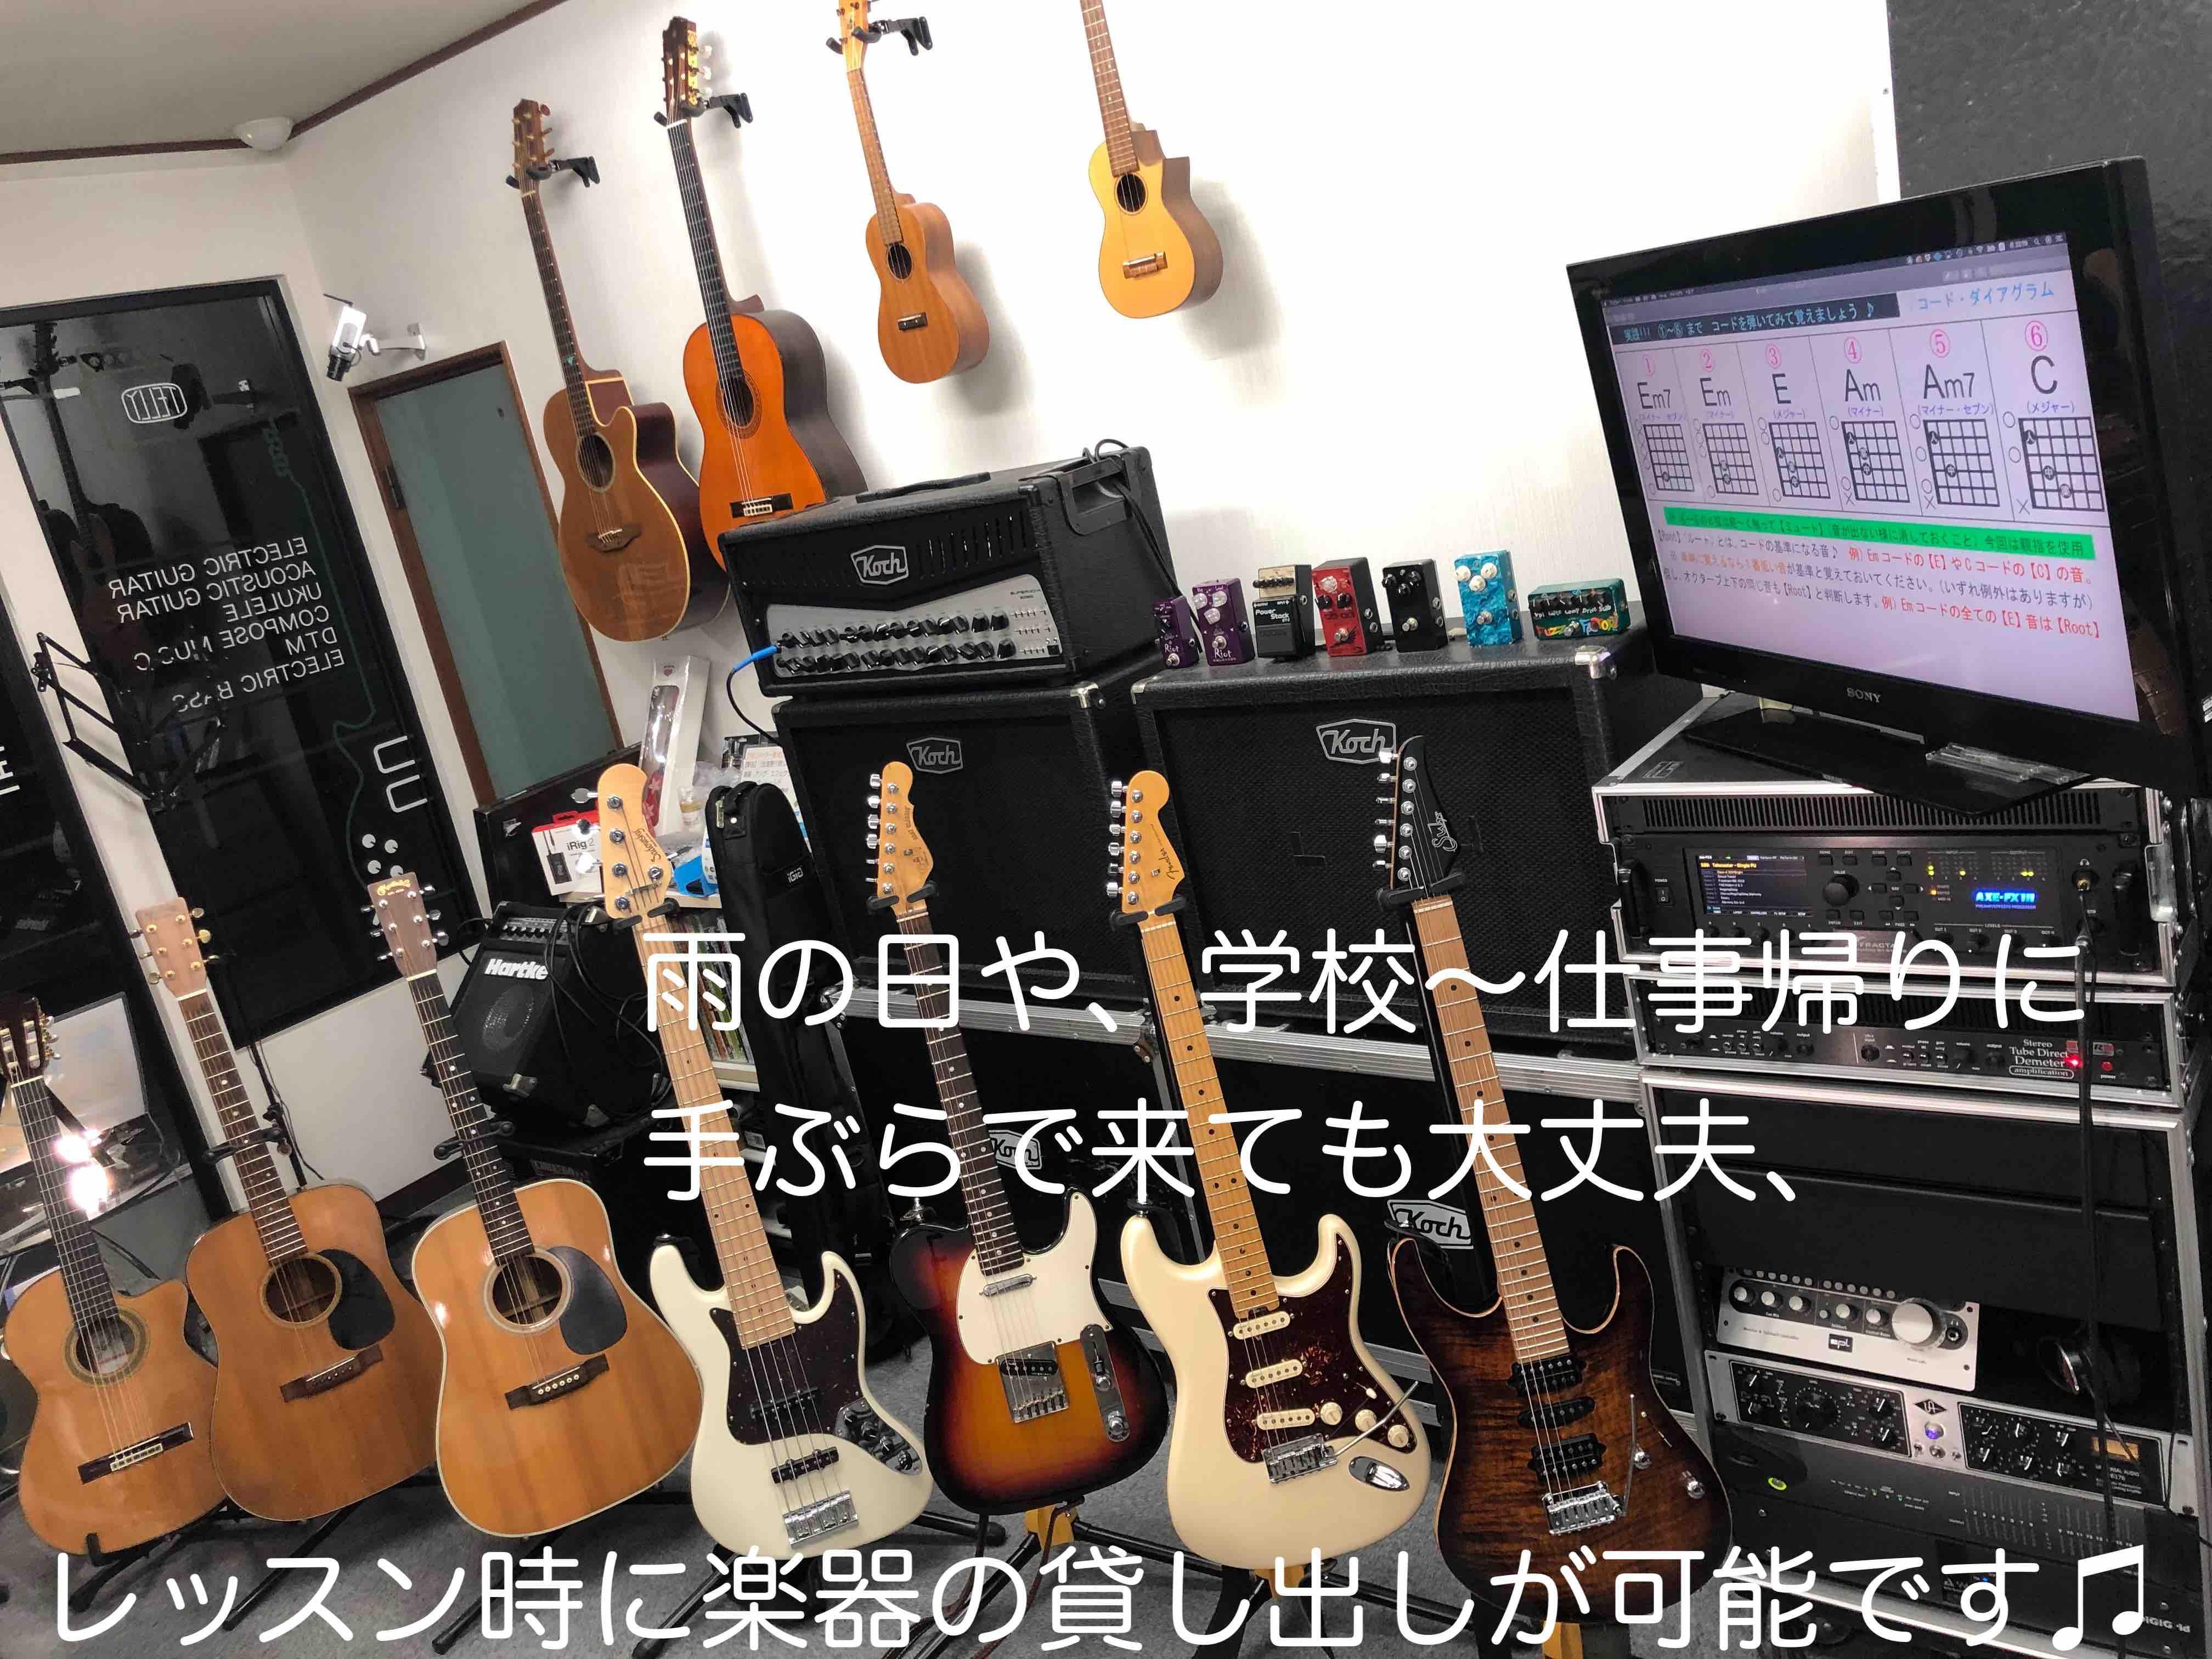 TELLYギター教室の楽器と設備